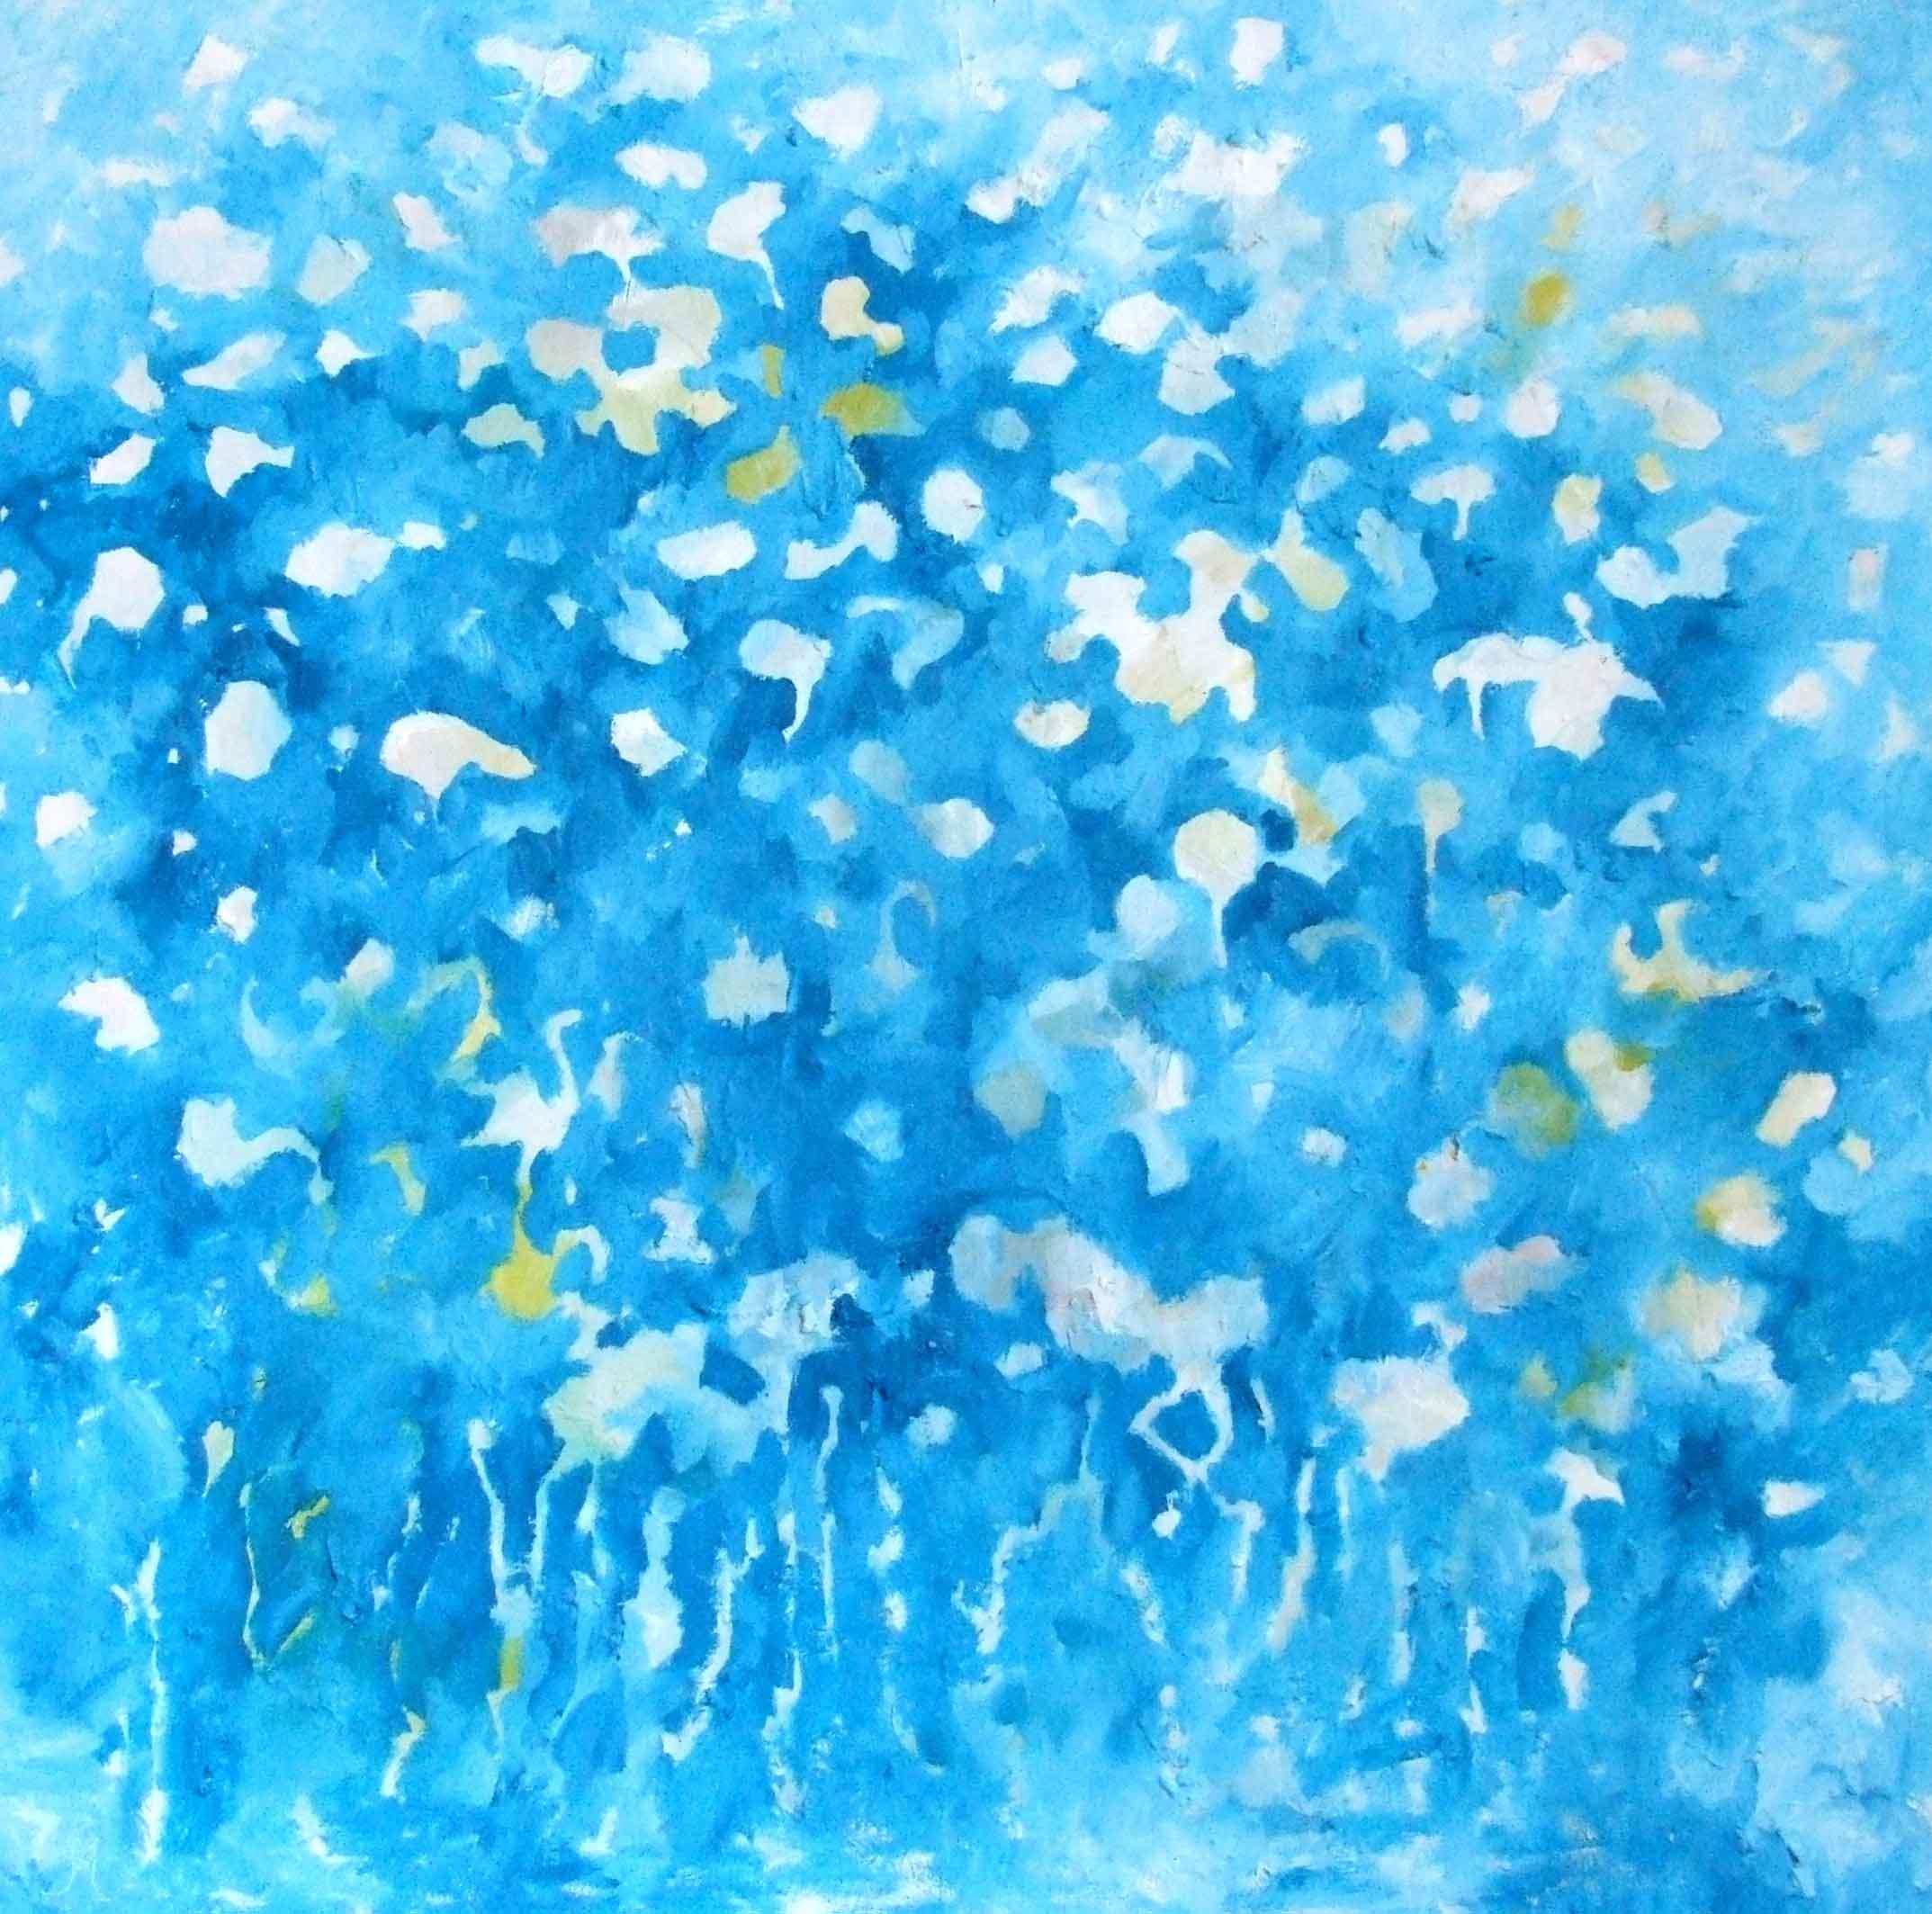 Star Struck, 1mx1m, oil on canvas